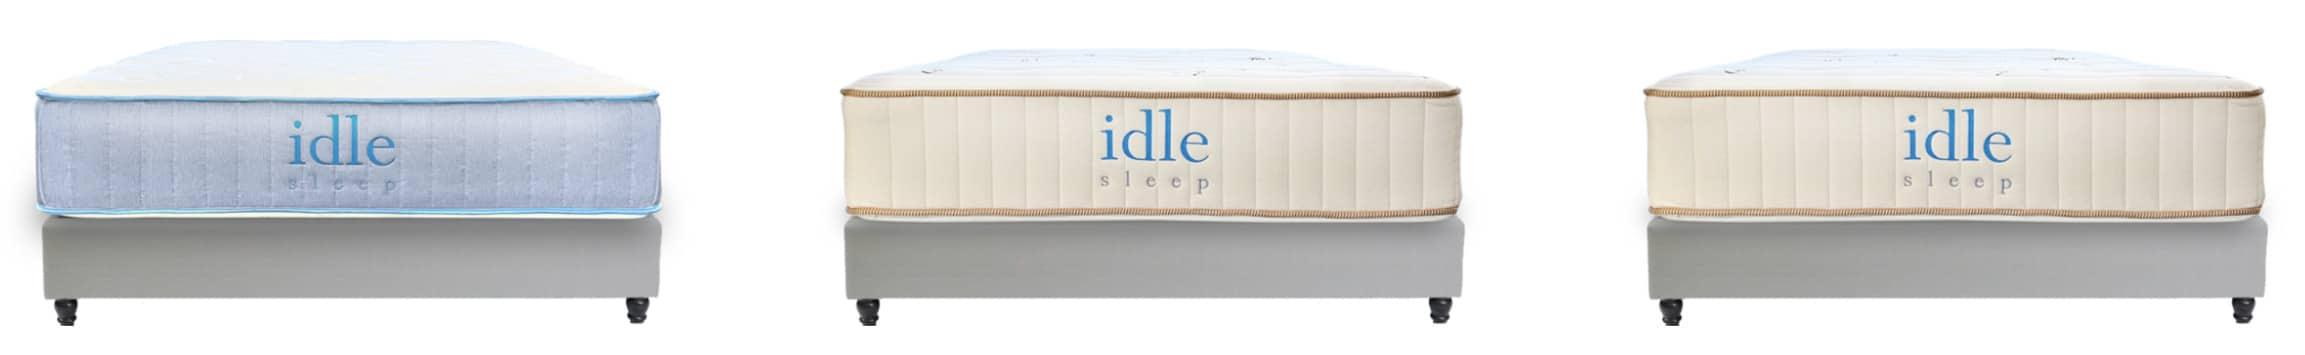 idle sleep mattresses review